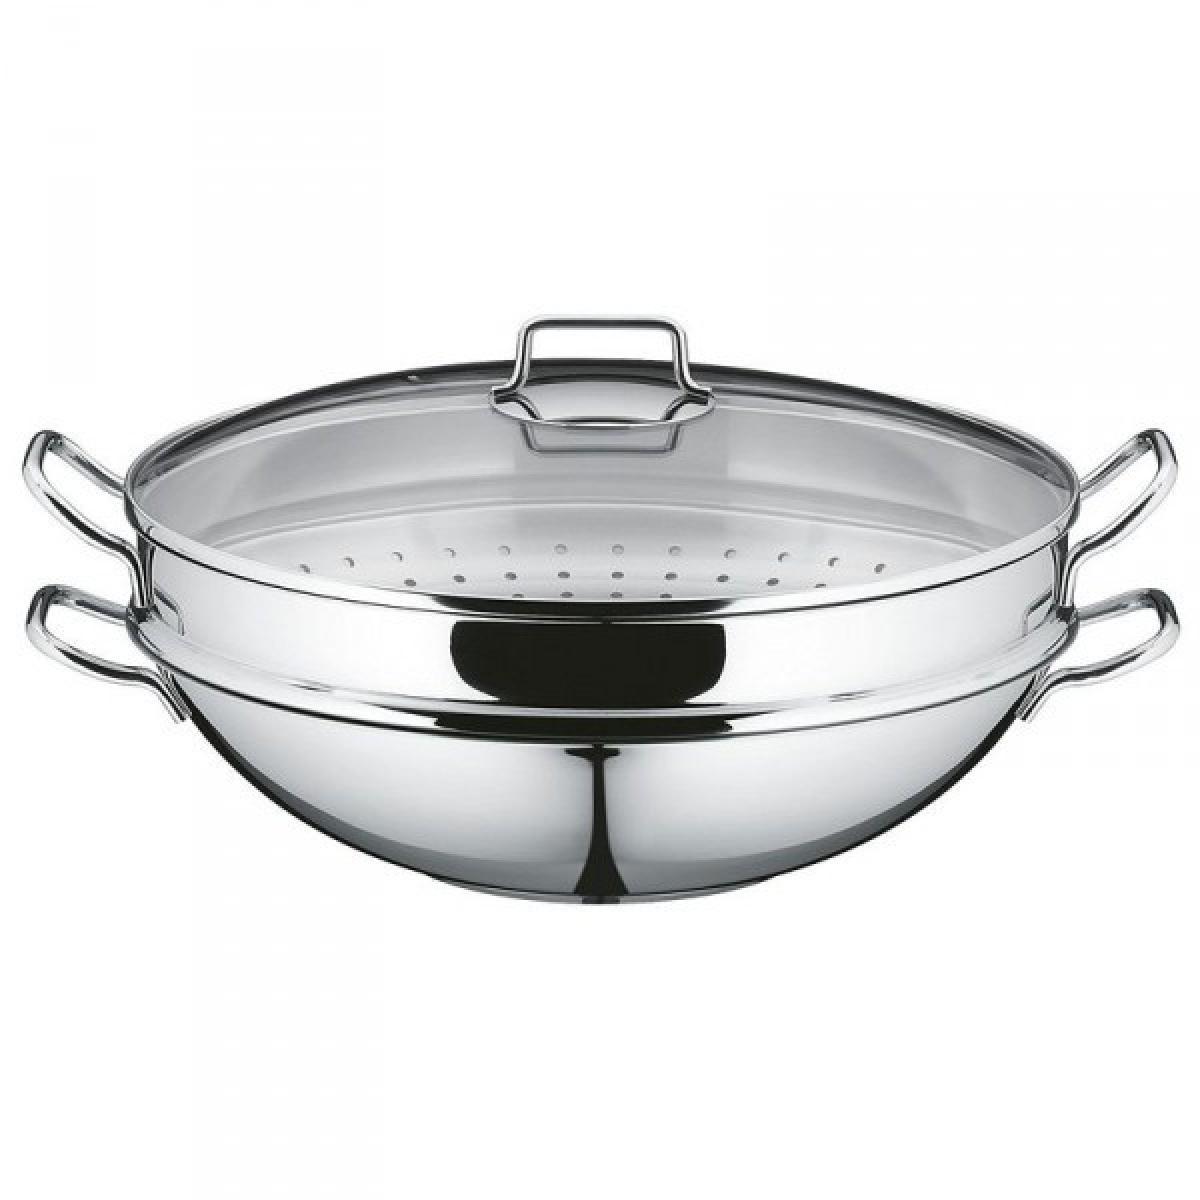 Wmf WMF Set wok 4 pièces Macao